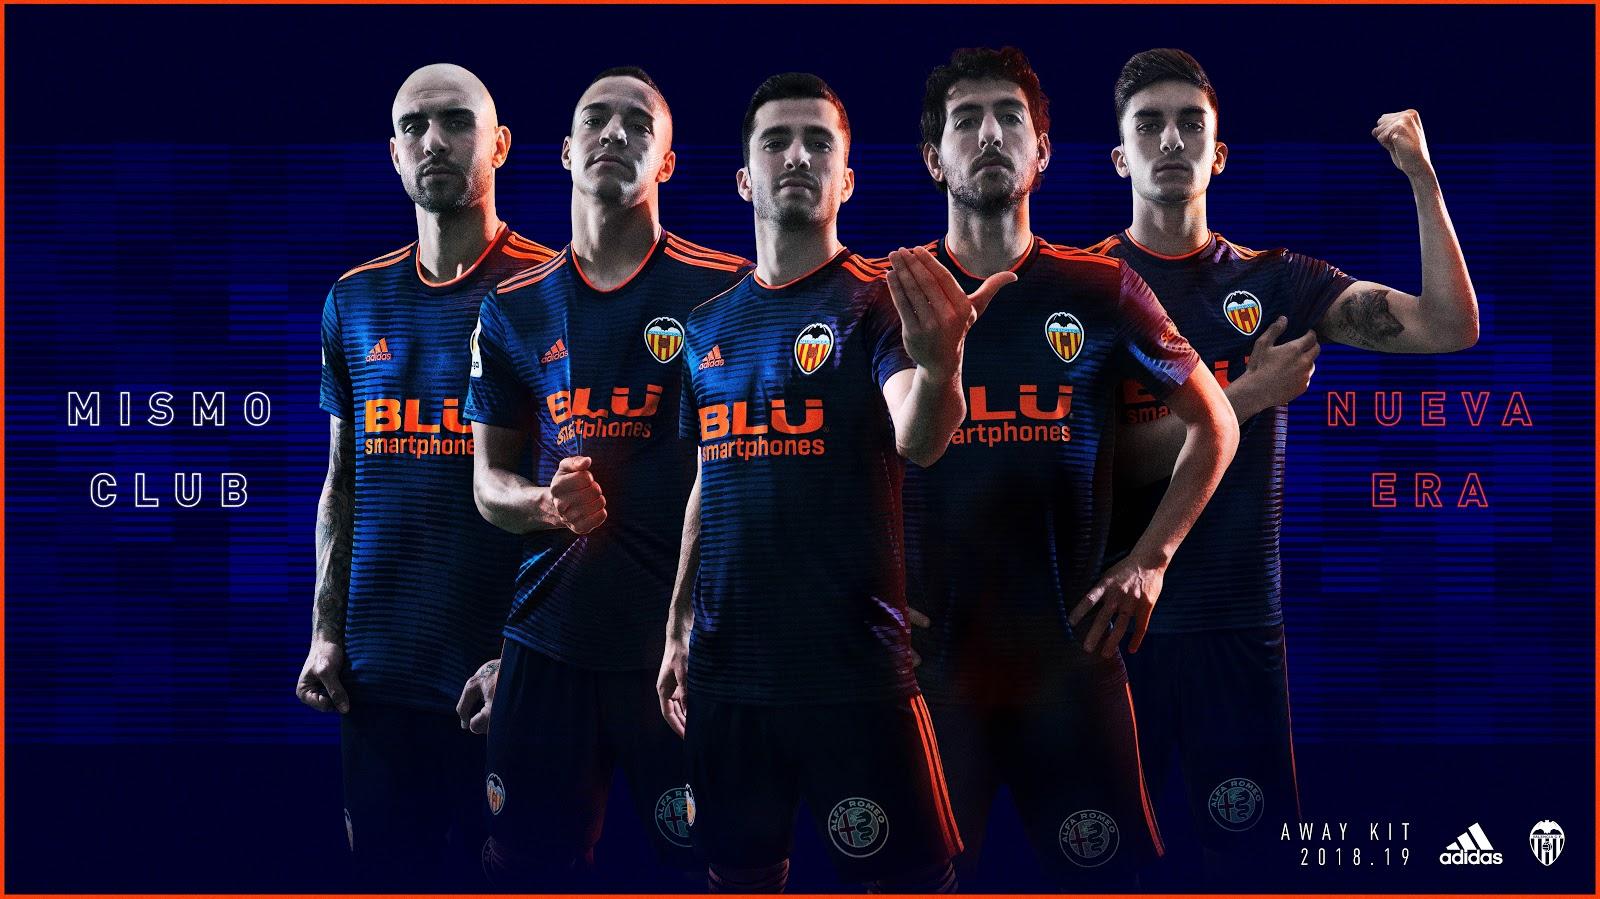 timeless design eb324 825e1 Valencia Adidas 2018-19 HOME JERSEY SHIRT SOCCER FUSSBALL REPLICA JERSEY  FOOTBALL BNWT TOP -